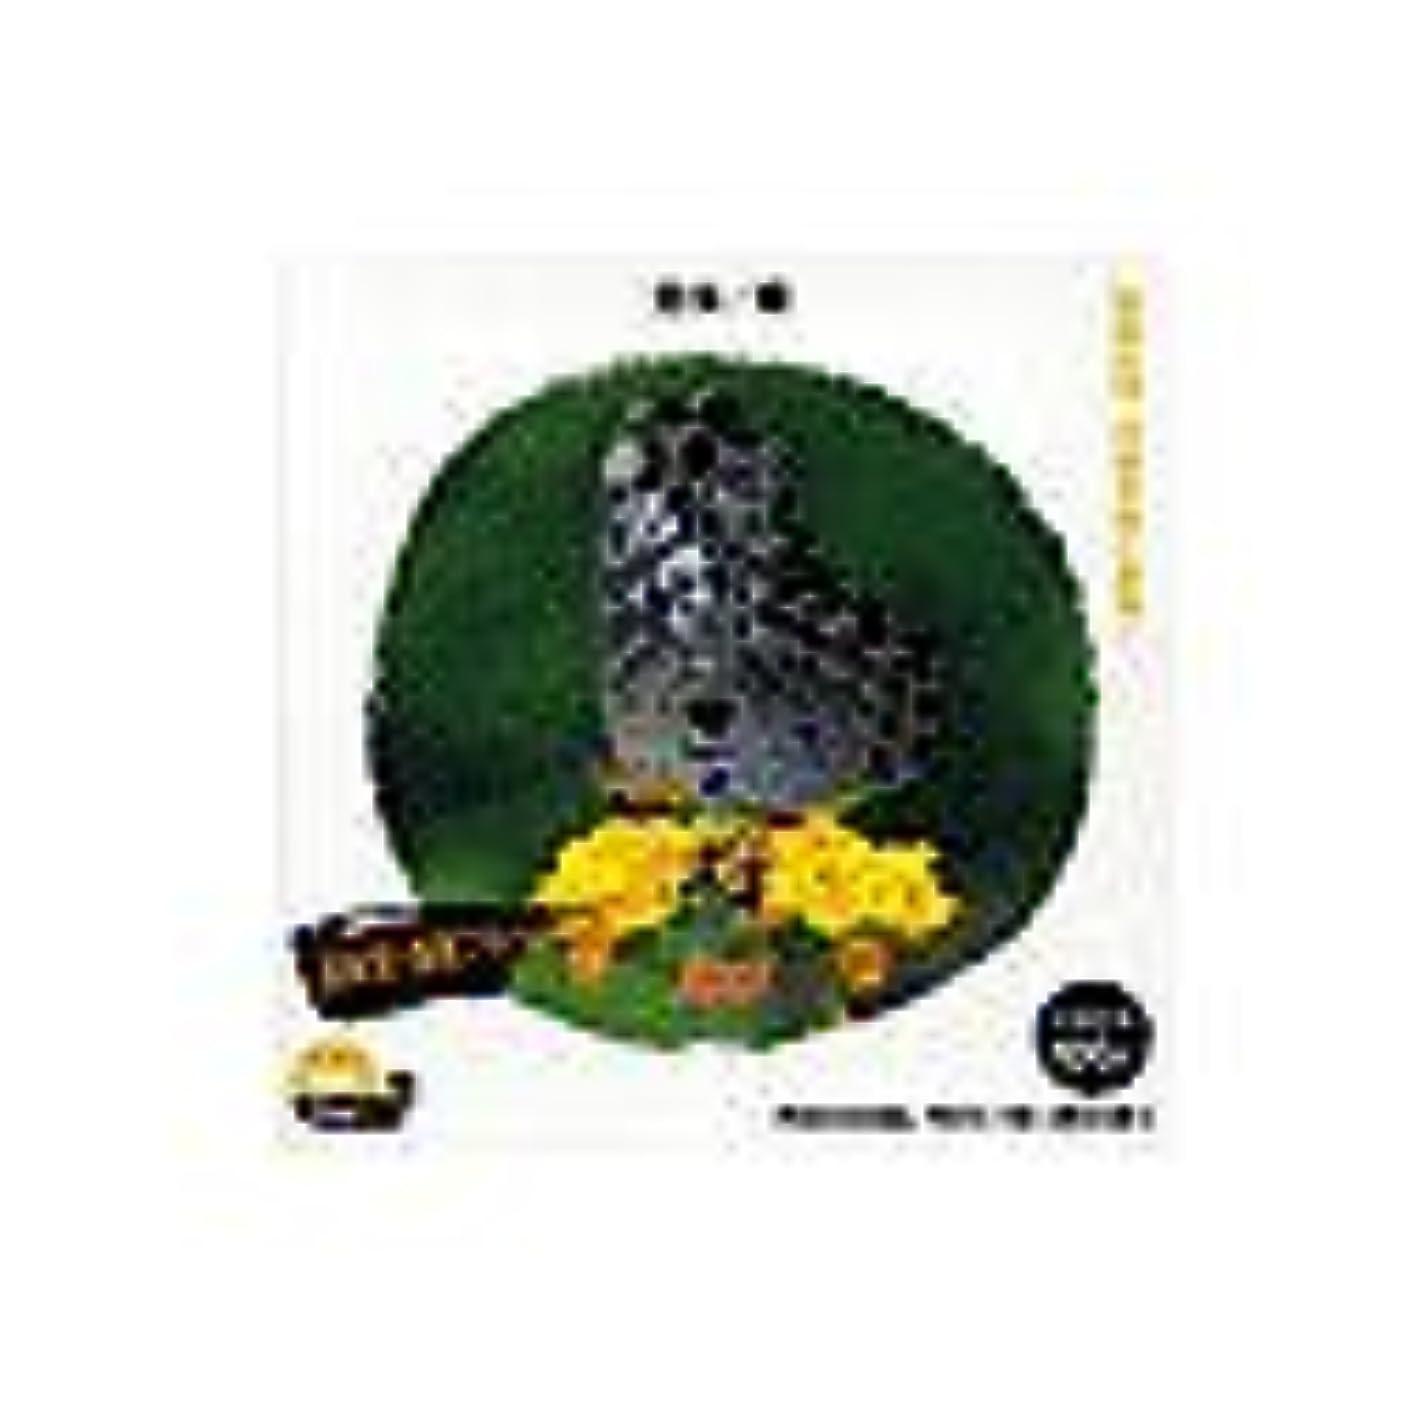 リンケージ最大限記念品創造素材100 昆虫/蝶